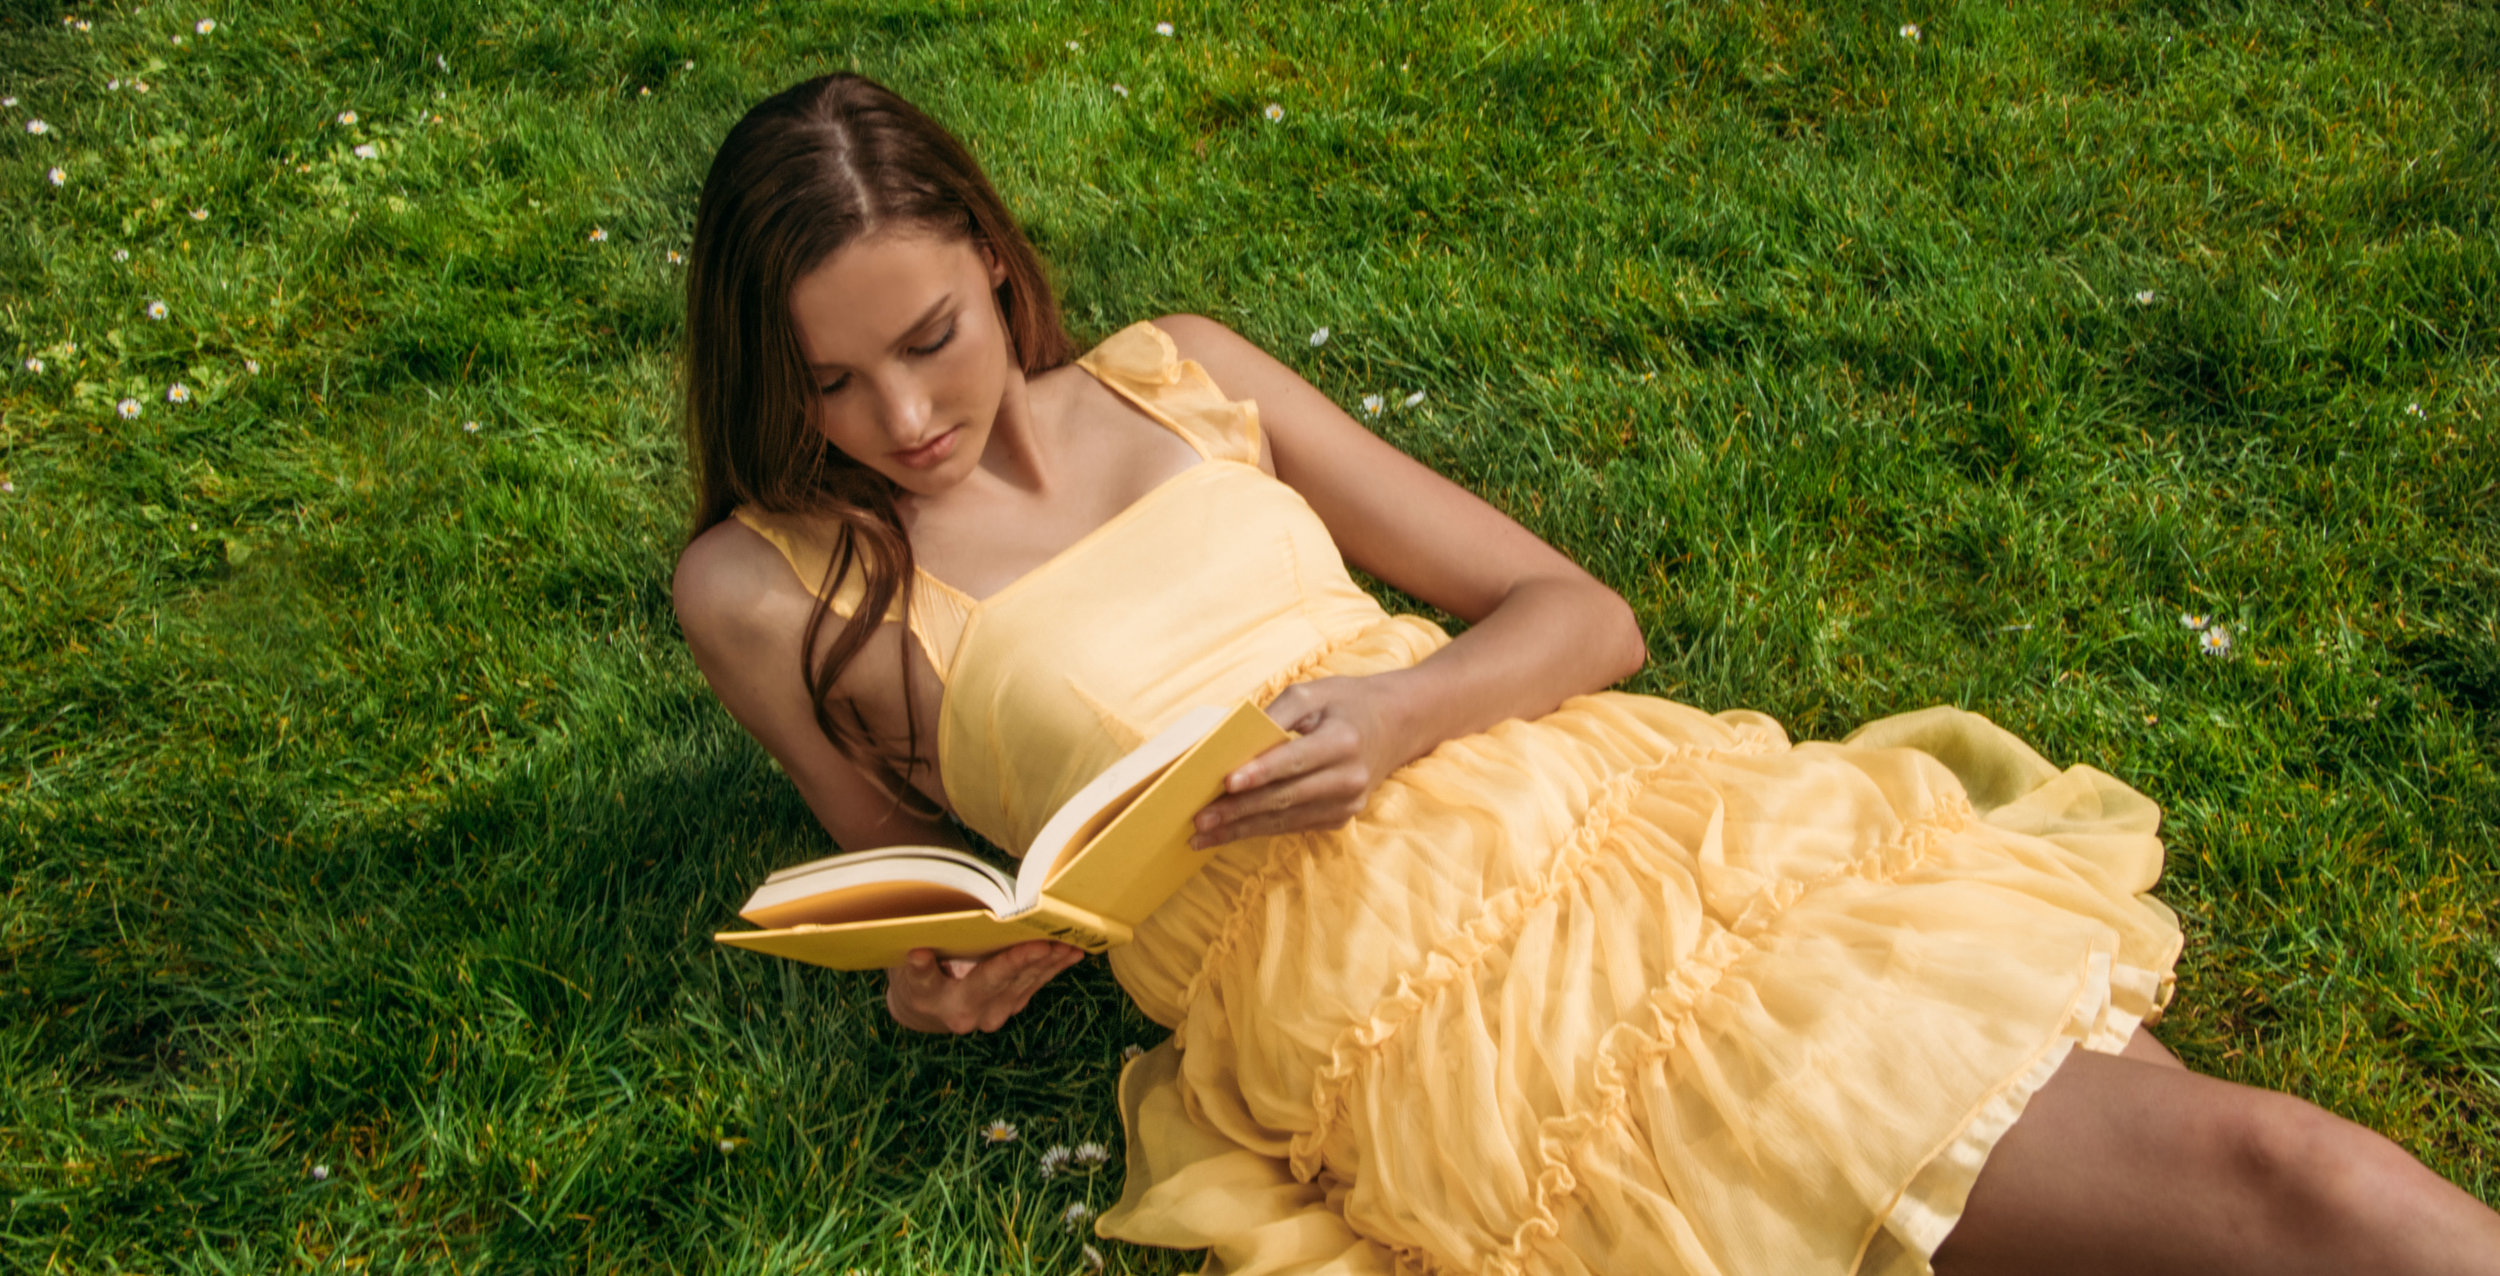 Alyssa_Nicole_Spring_2019_EmiliaDress_1.jpg